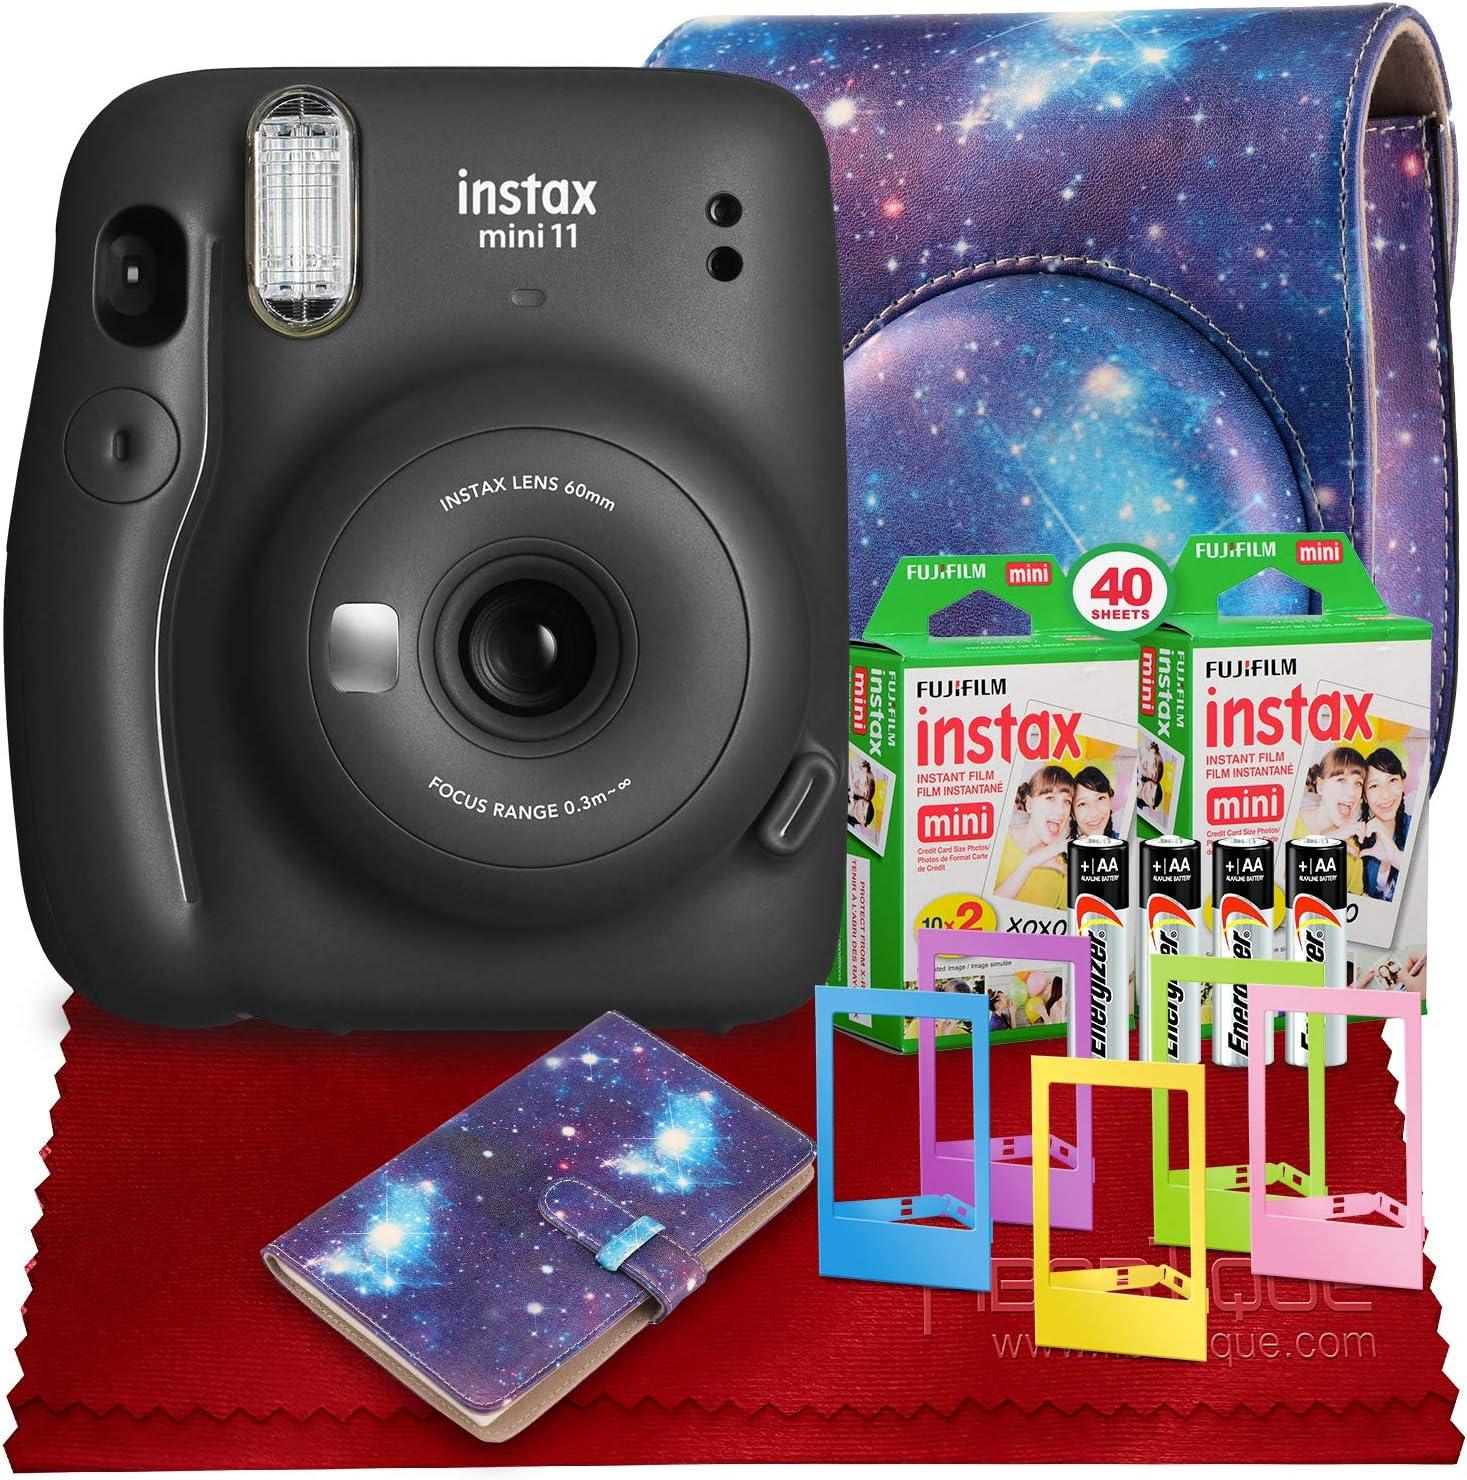 PS FUJIFILM INSTAX Mini 11 Instant Film Camera (Charcoal Gray) with Fujifilm Instax Mini Twin Film (40 Exposures), Accessory Case, and Accessories Bundle